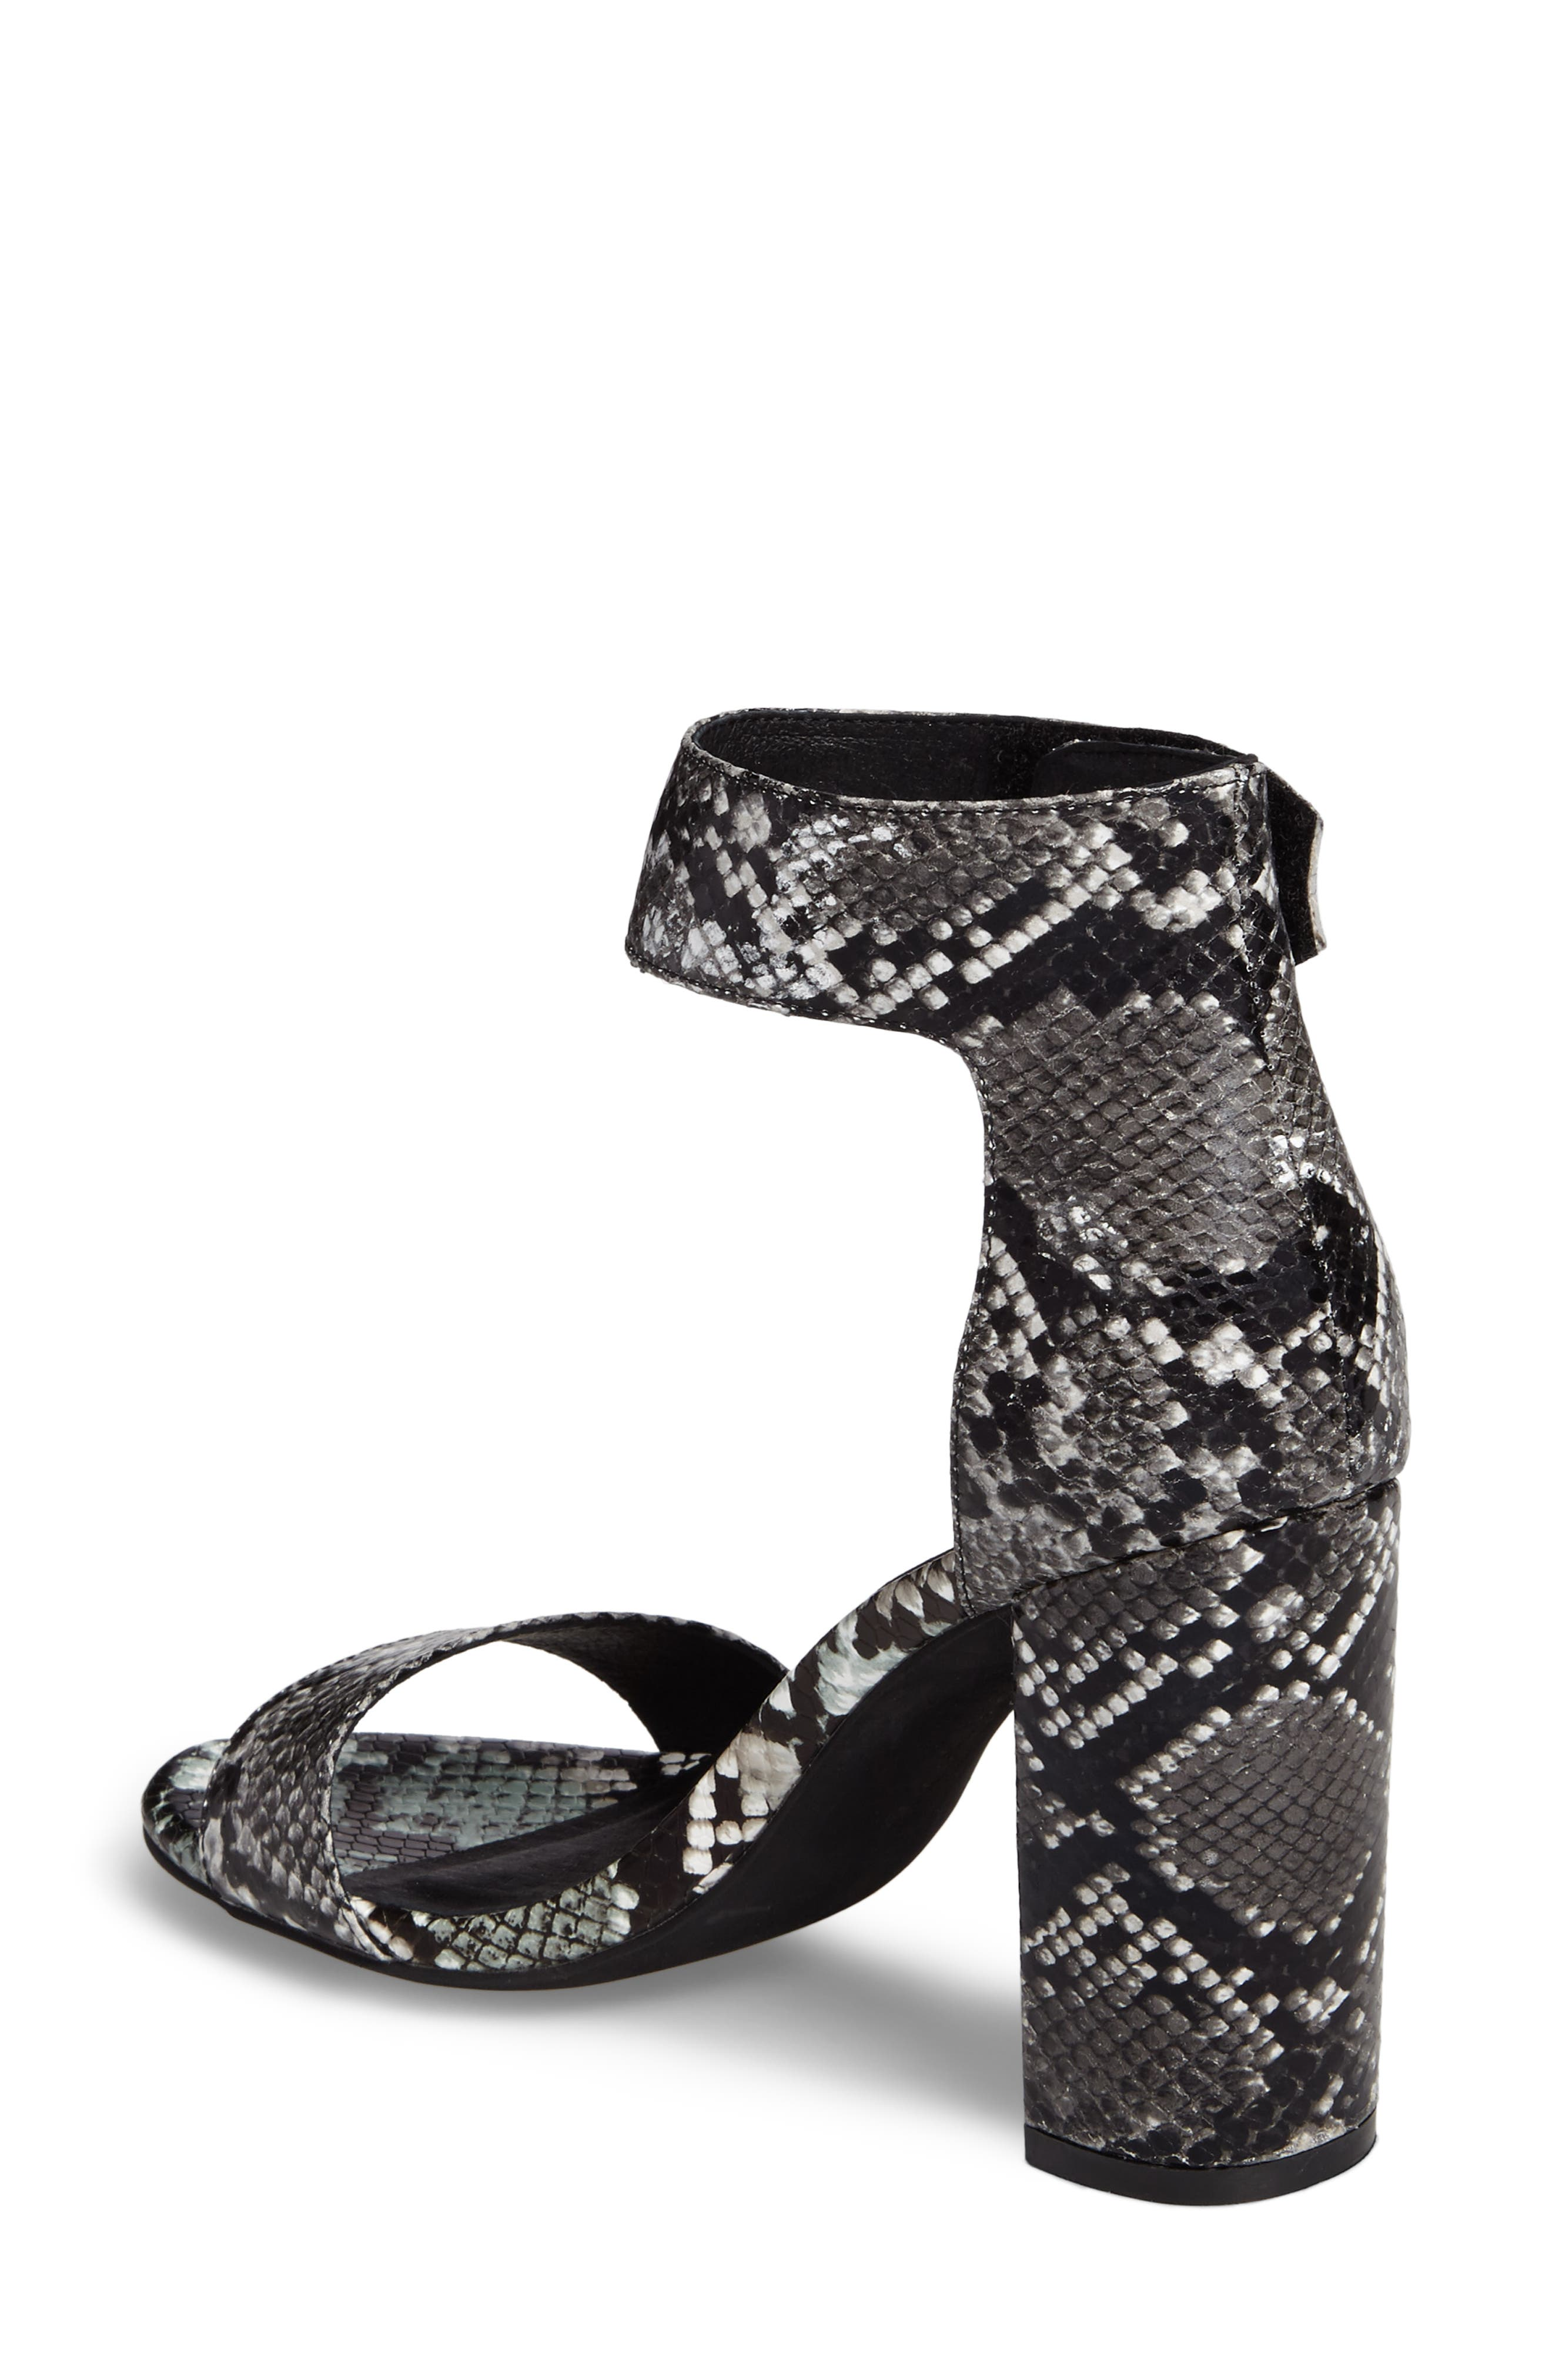 'Lindsay' Ankle Strap Sandal,                             Alternate thumbnail 2, color,                             Black Grey Snake